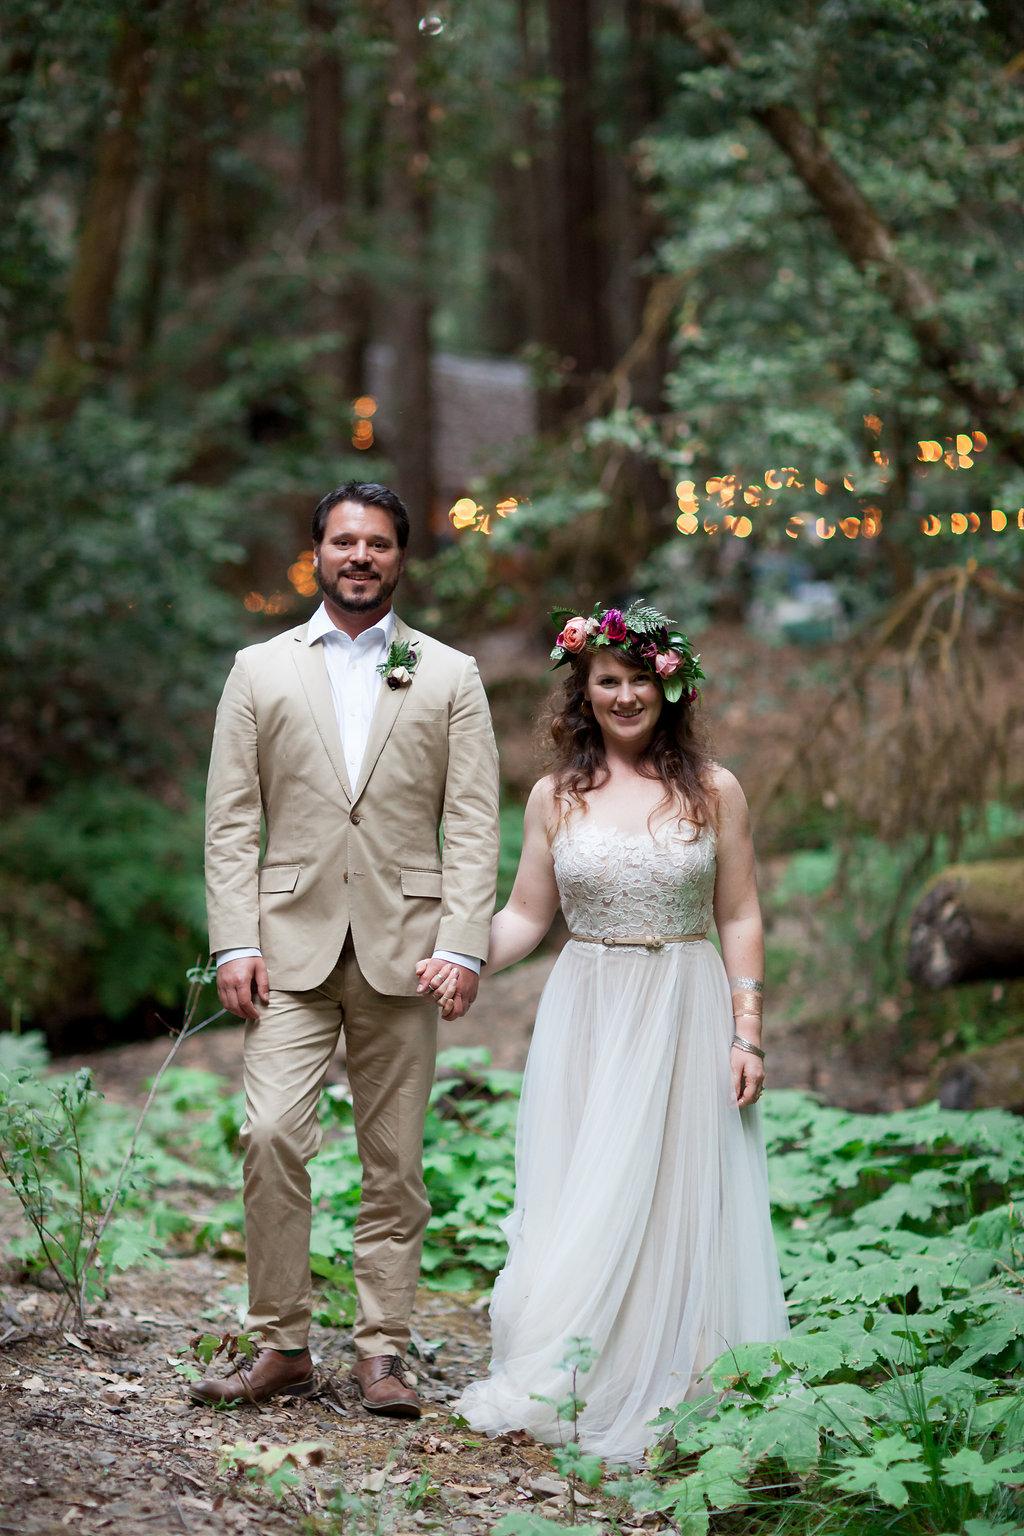 lillich-manogue-wedding-1700.jpg